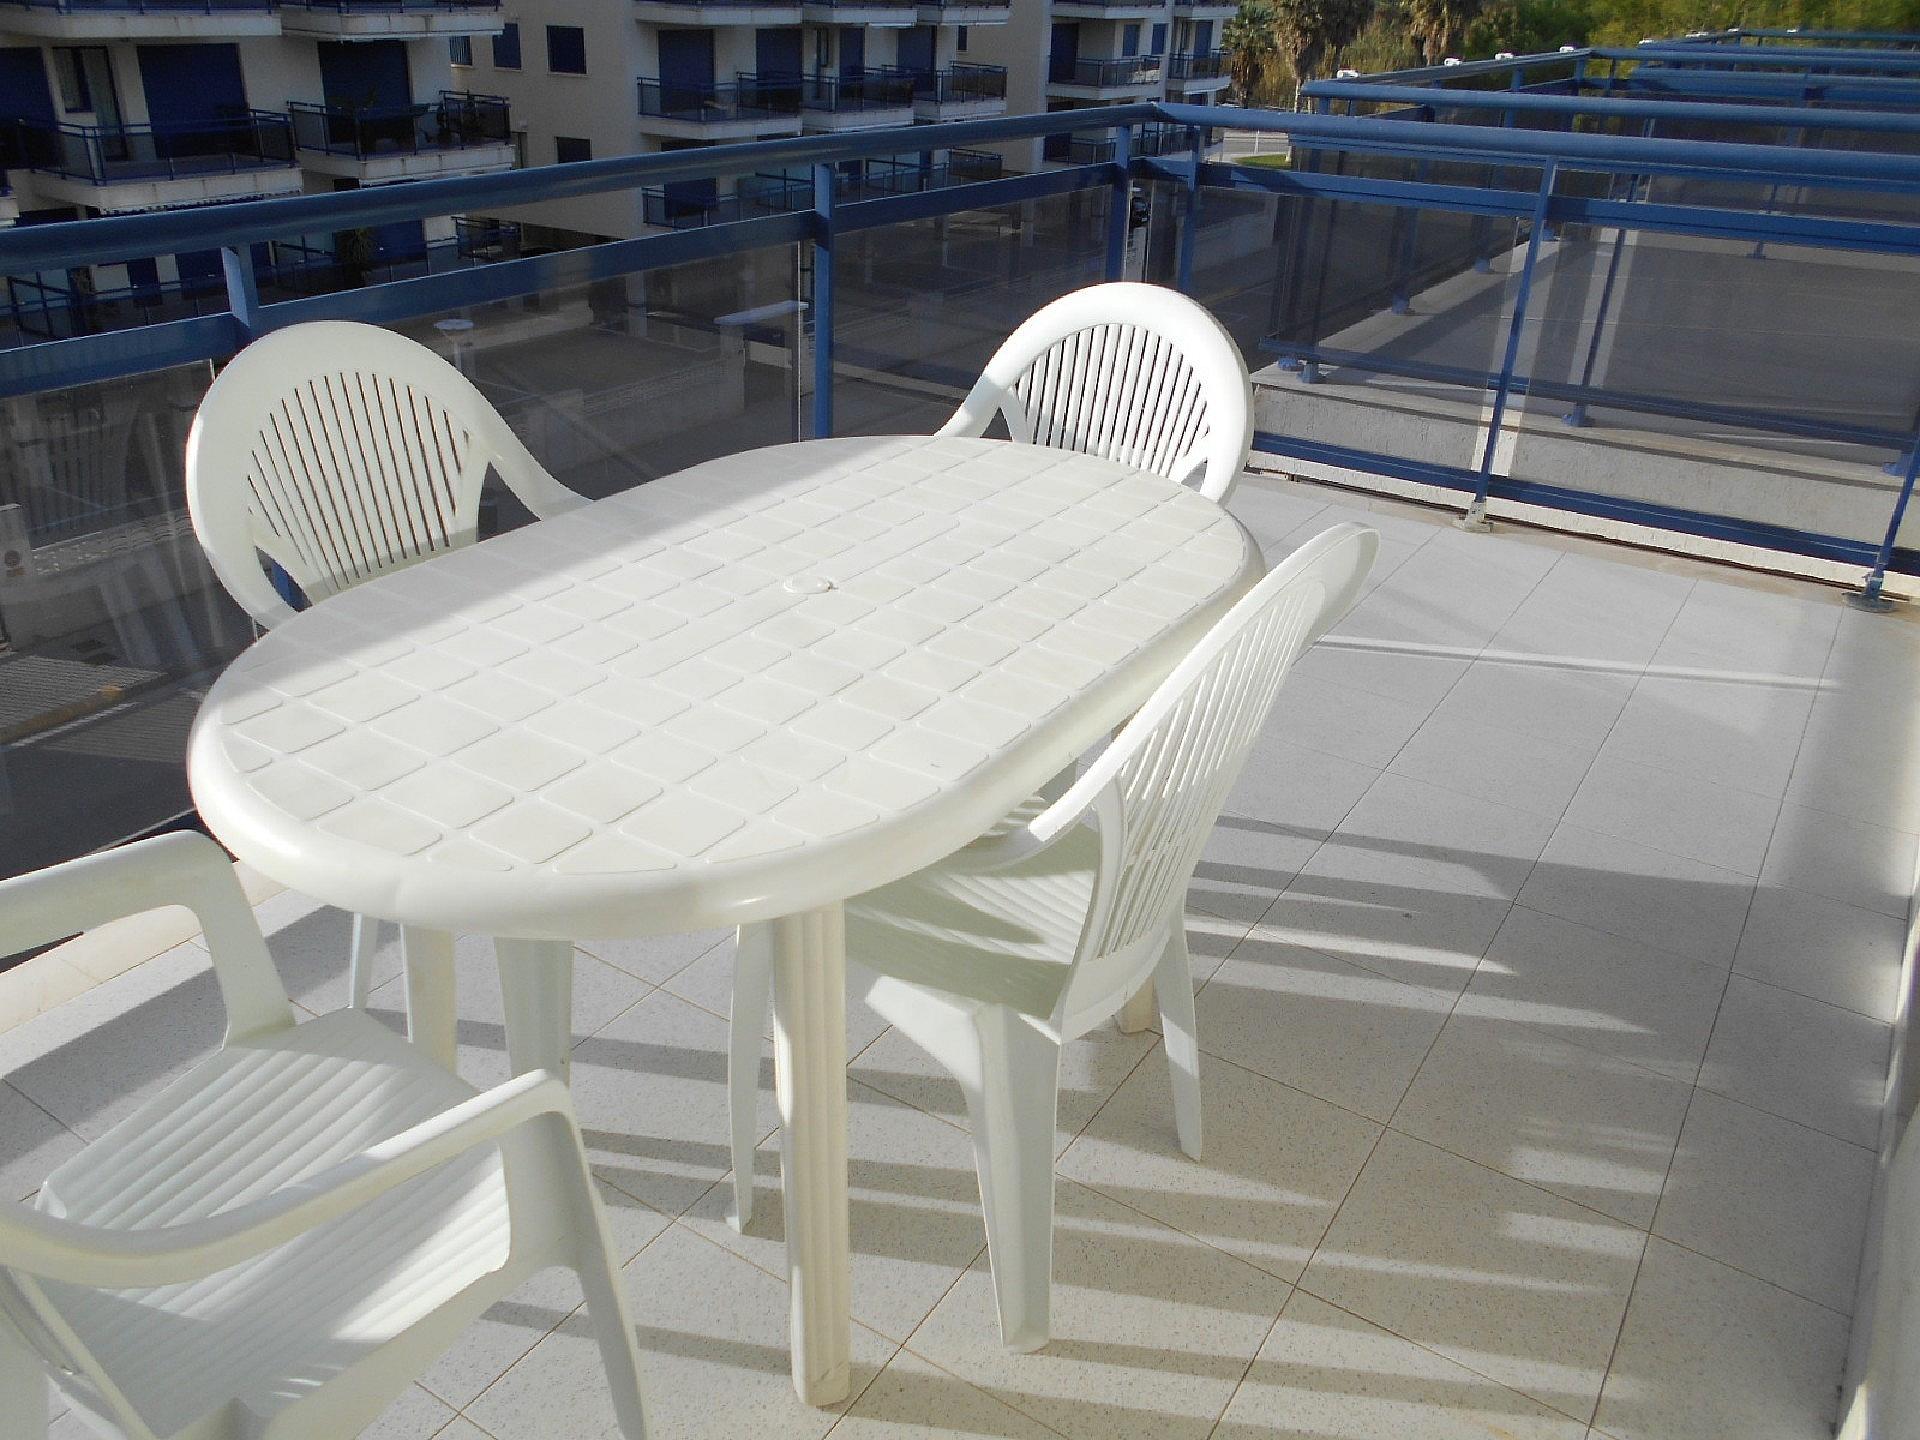 Foto 6 - Piso en alquiler en Guardamar - 285942167